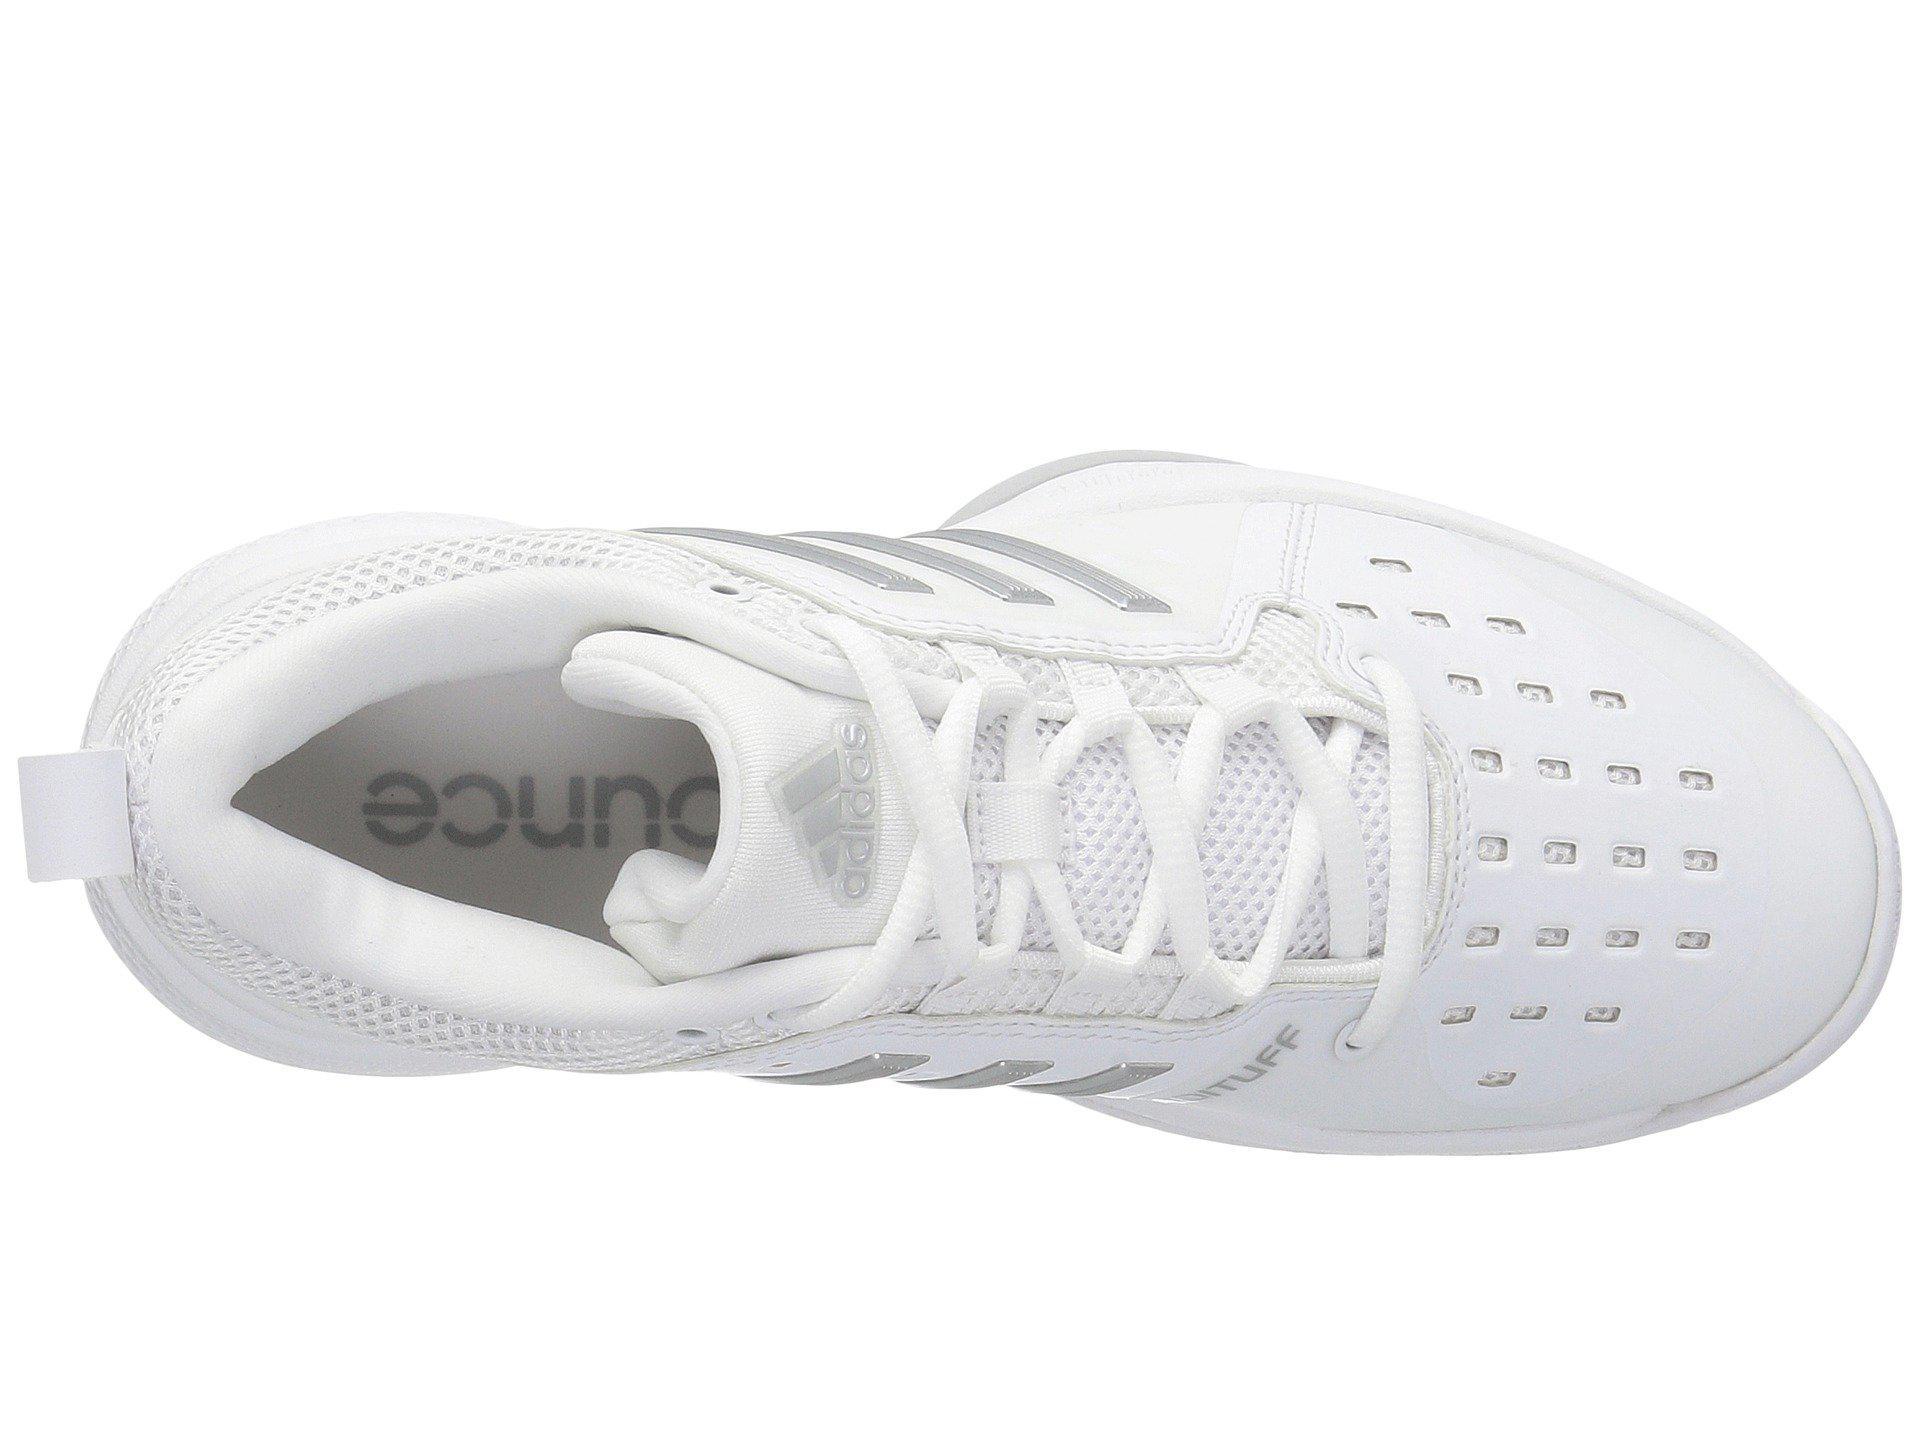 288c78068 Adidas - Metallic Barricade Classic Bounce - Lyst. View fullscreen